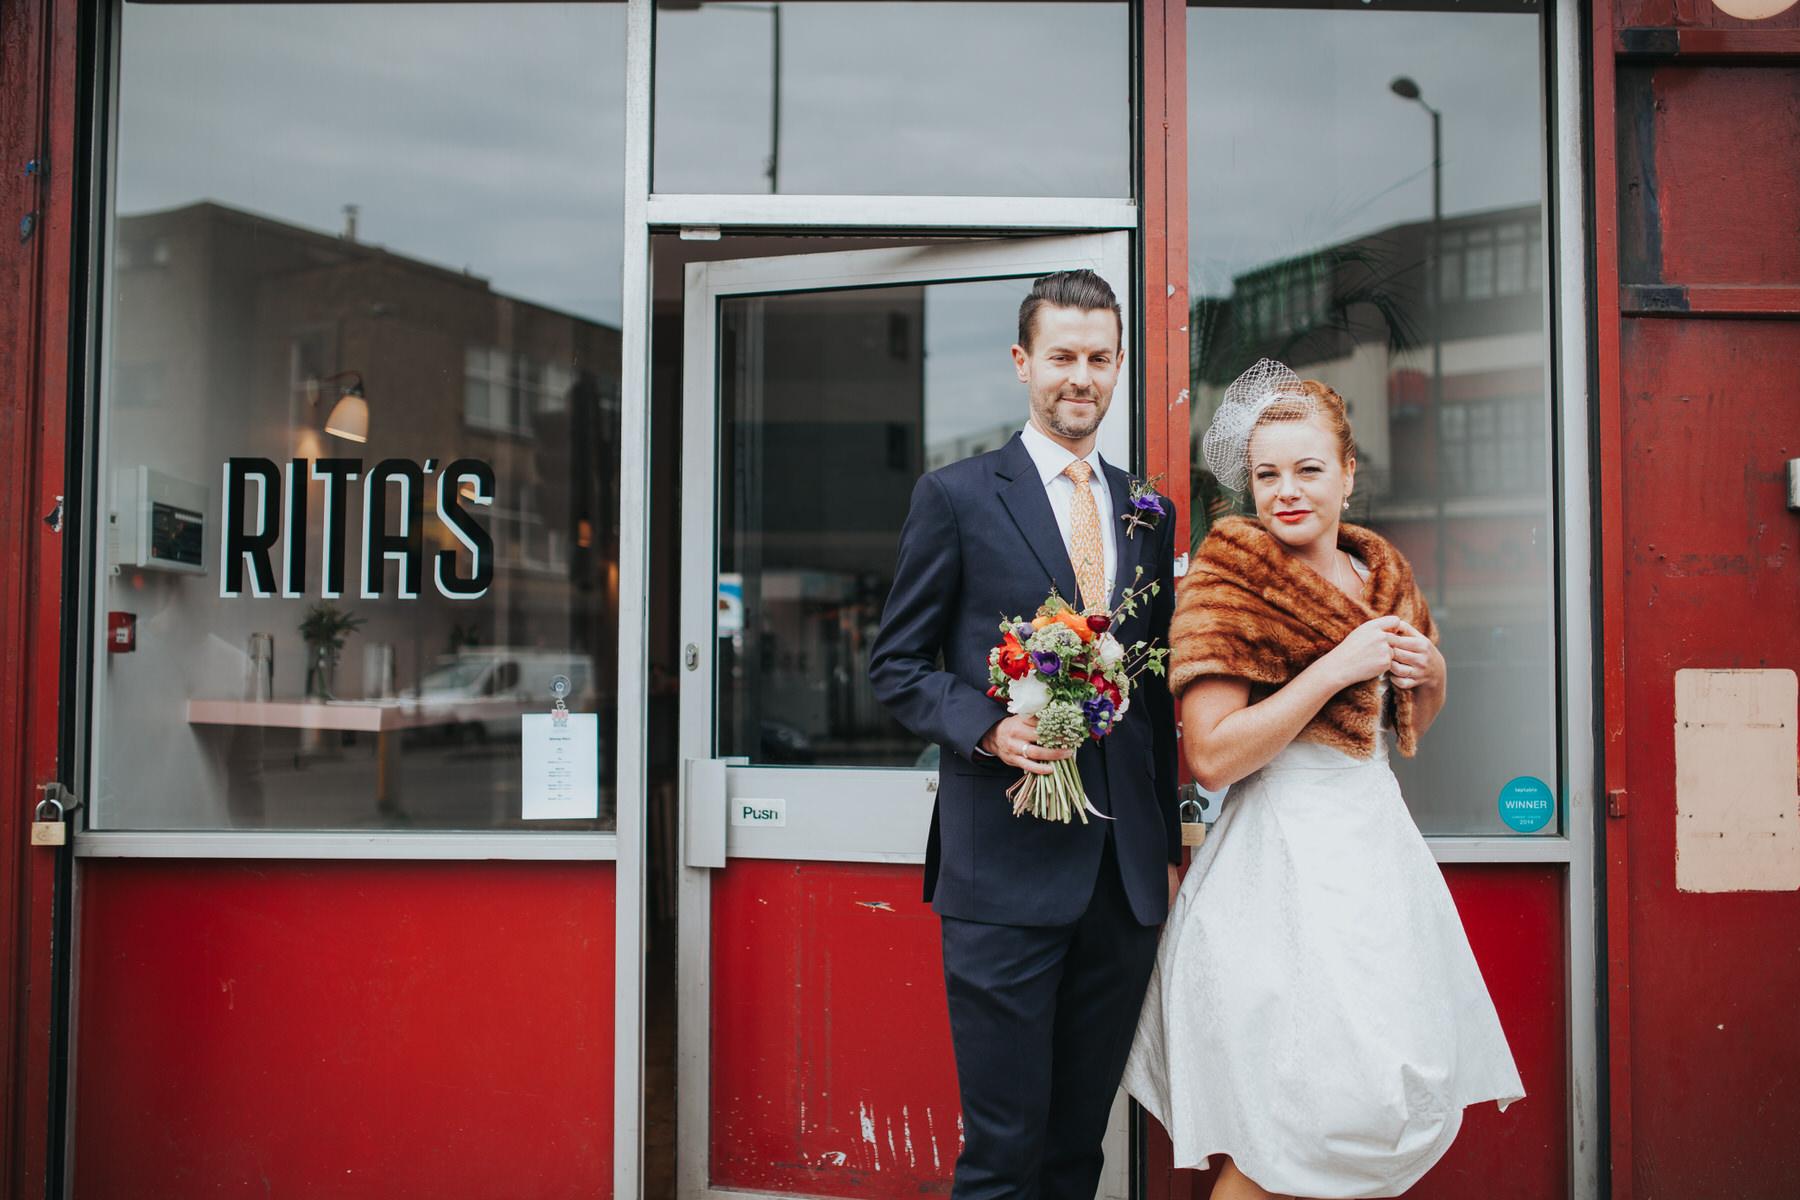 Hackney alternative wedding groom outside Ritas holding bouquet bride fur stole.jpg